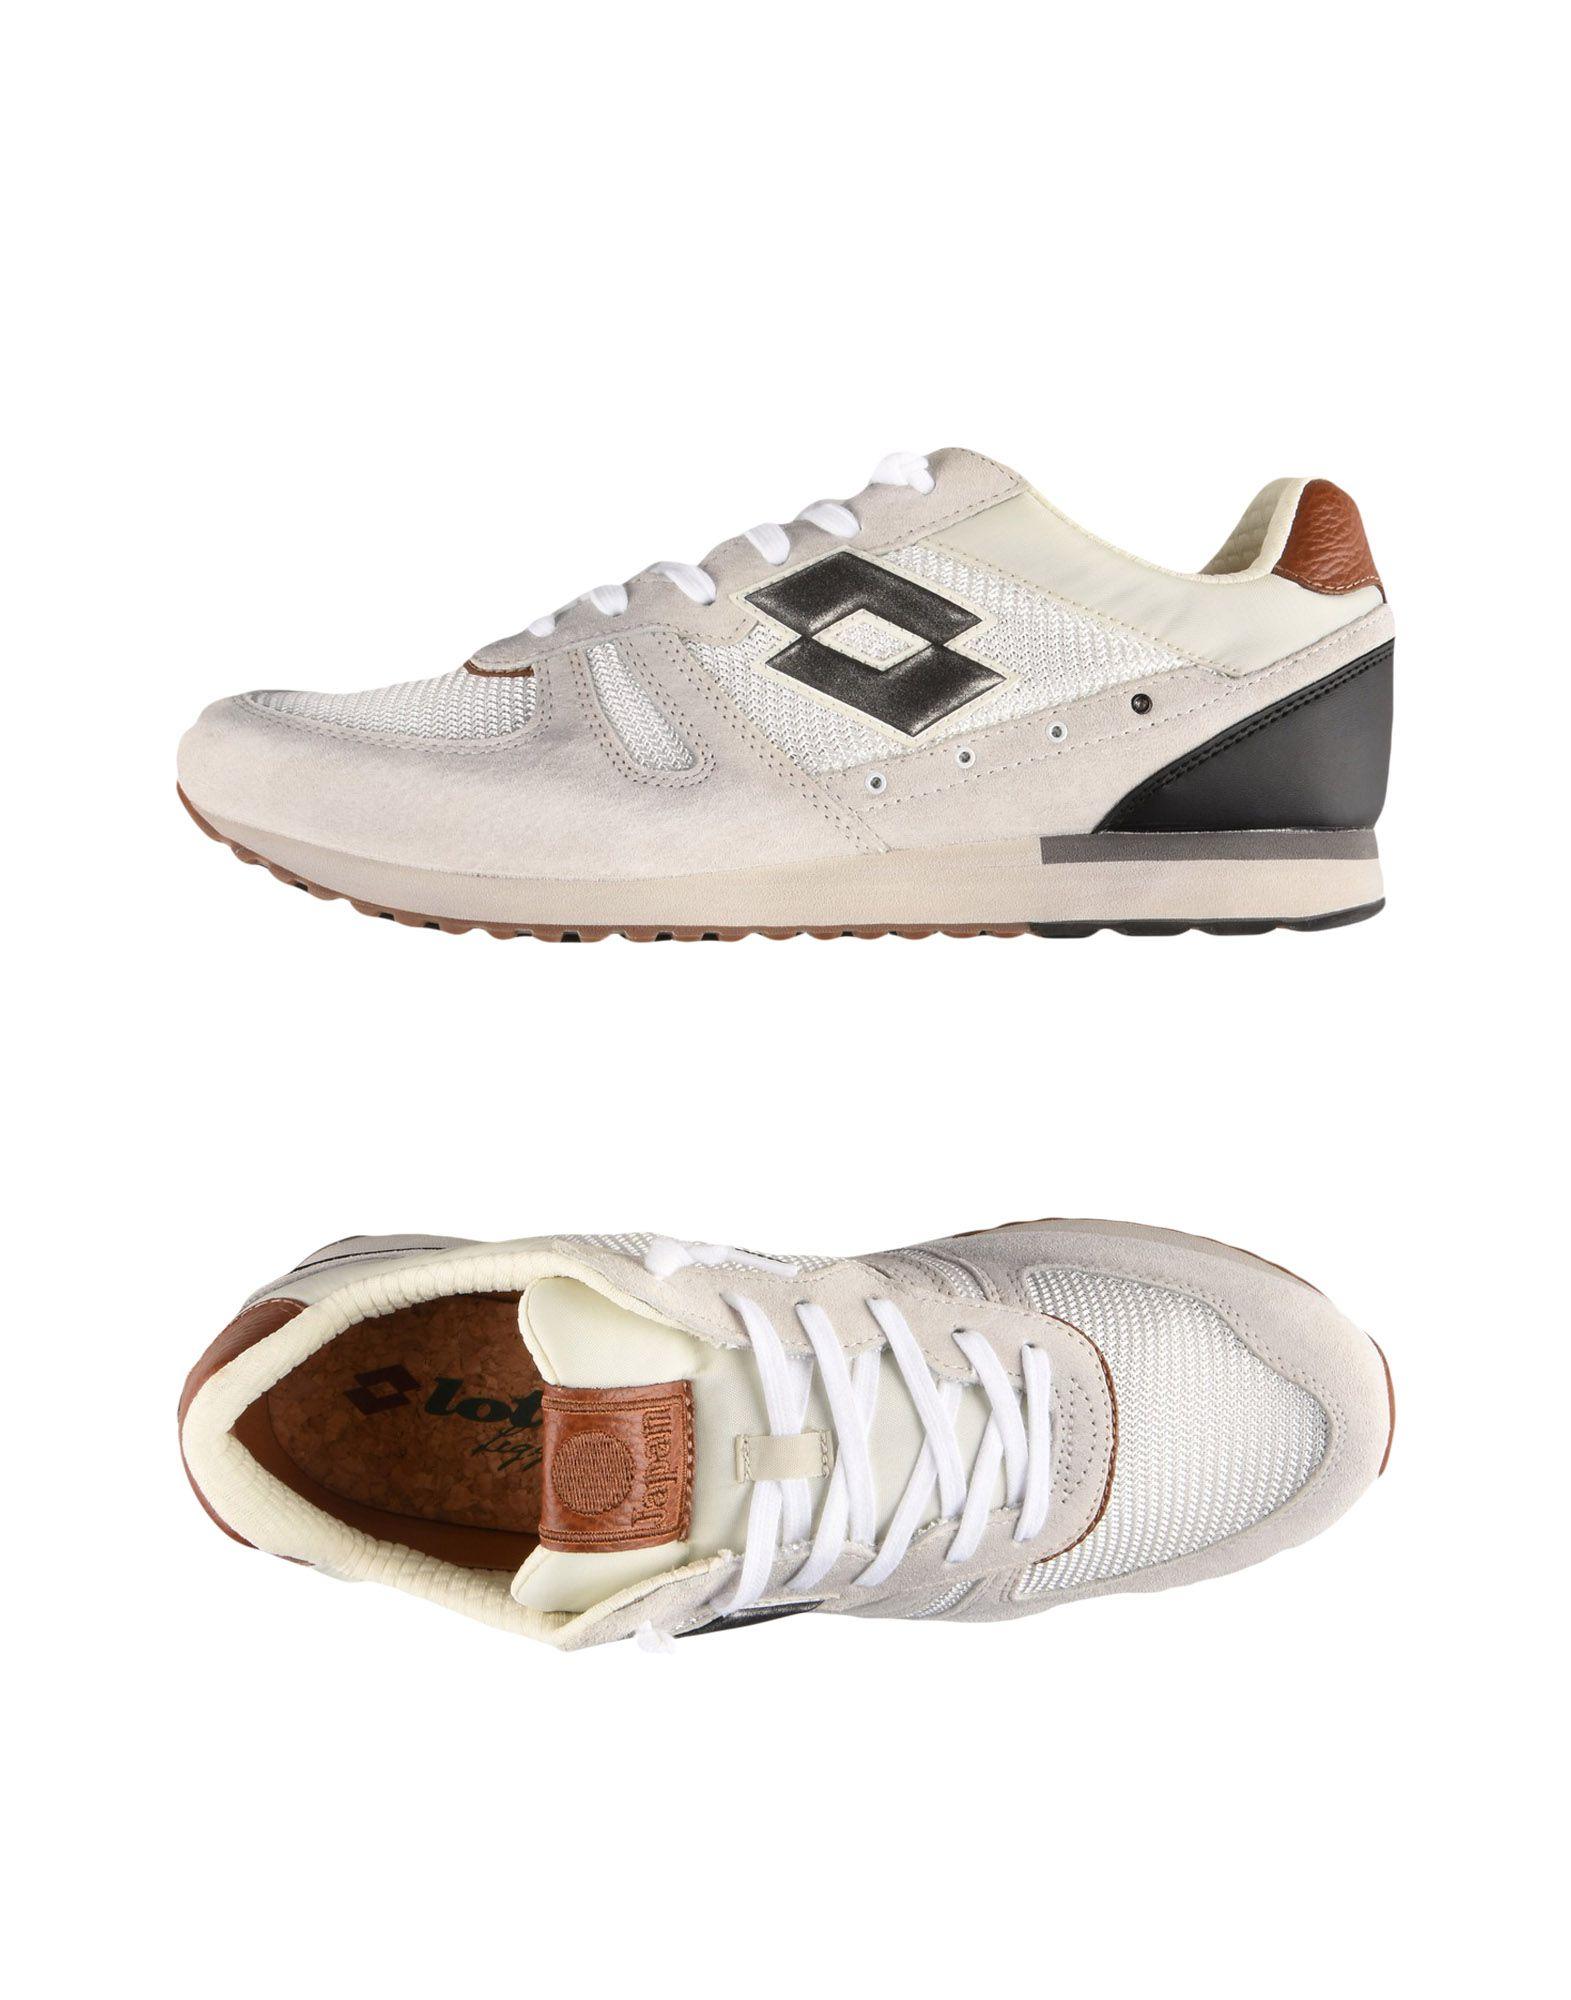 Lotto Leggenda  Tokyo Shibuya - Sneakers - Men on Lotto Leggenda Sneakers online on Men  Canada - 11237600XI 58320b